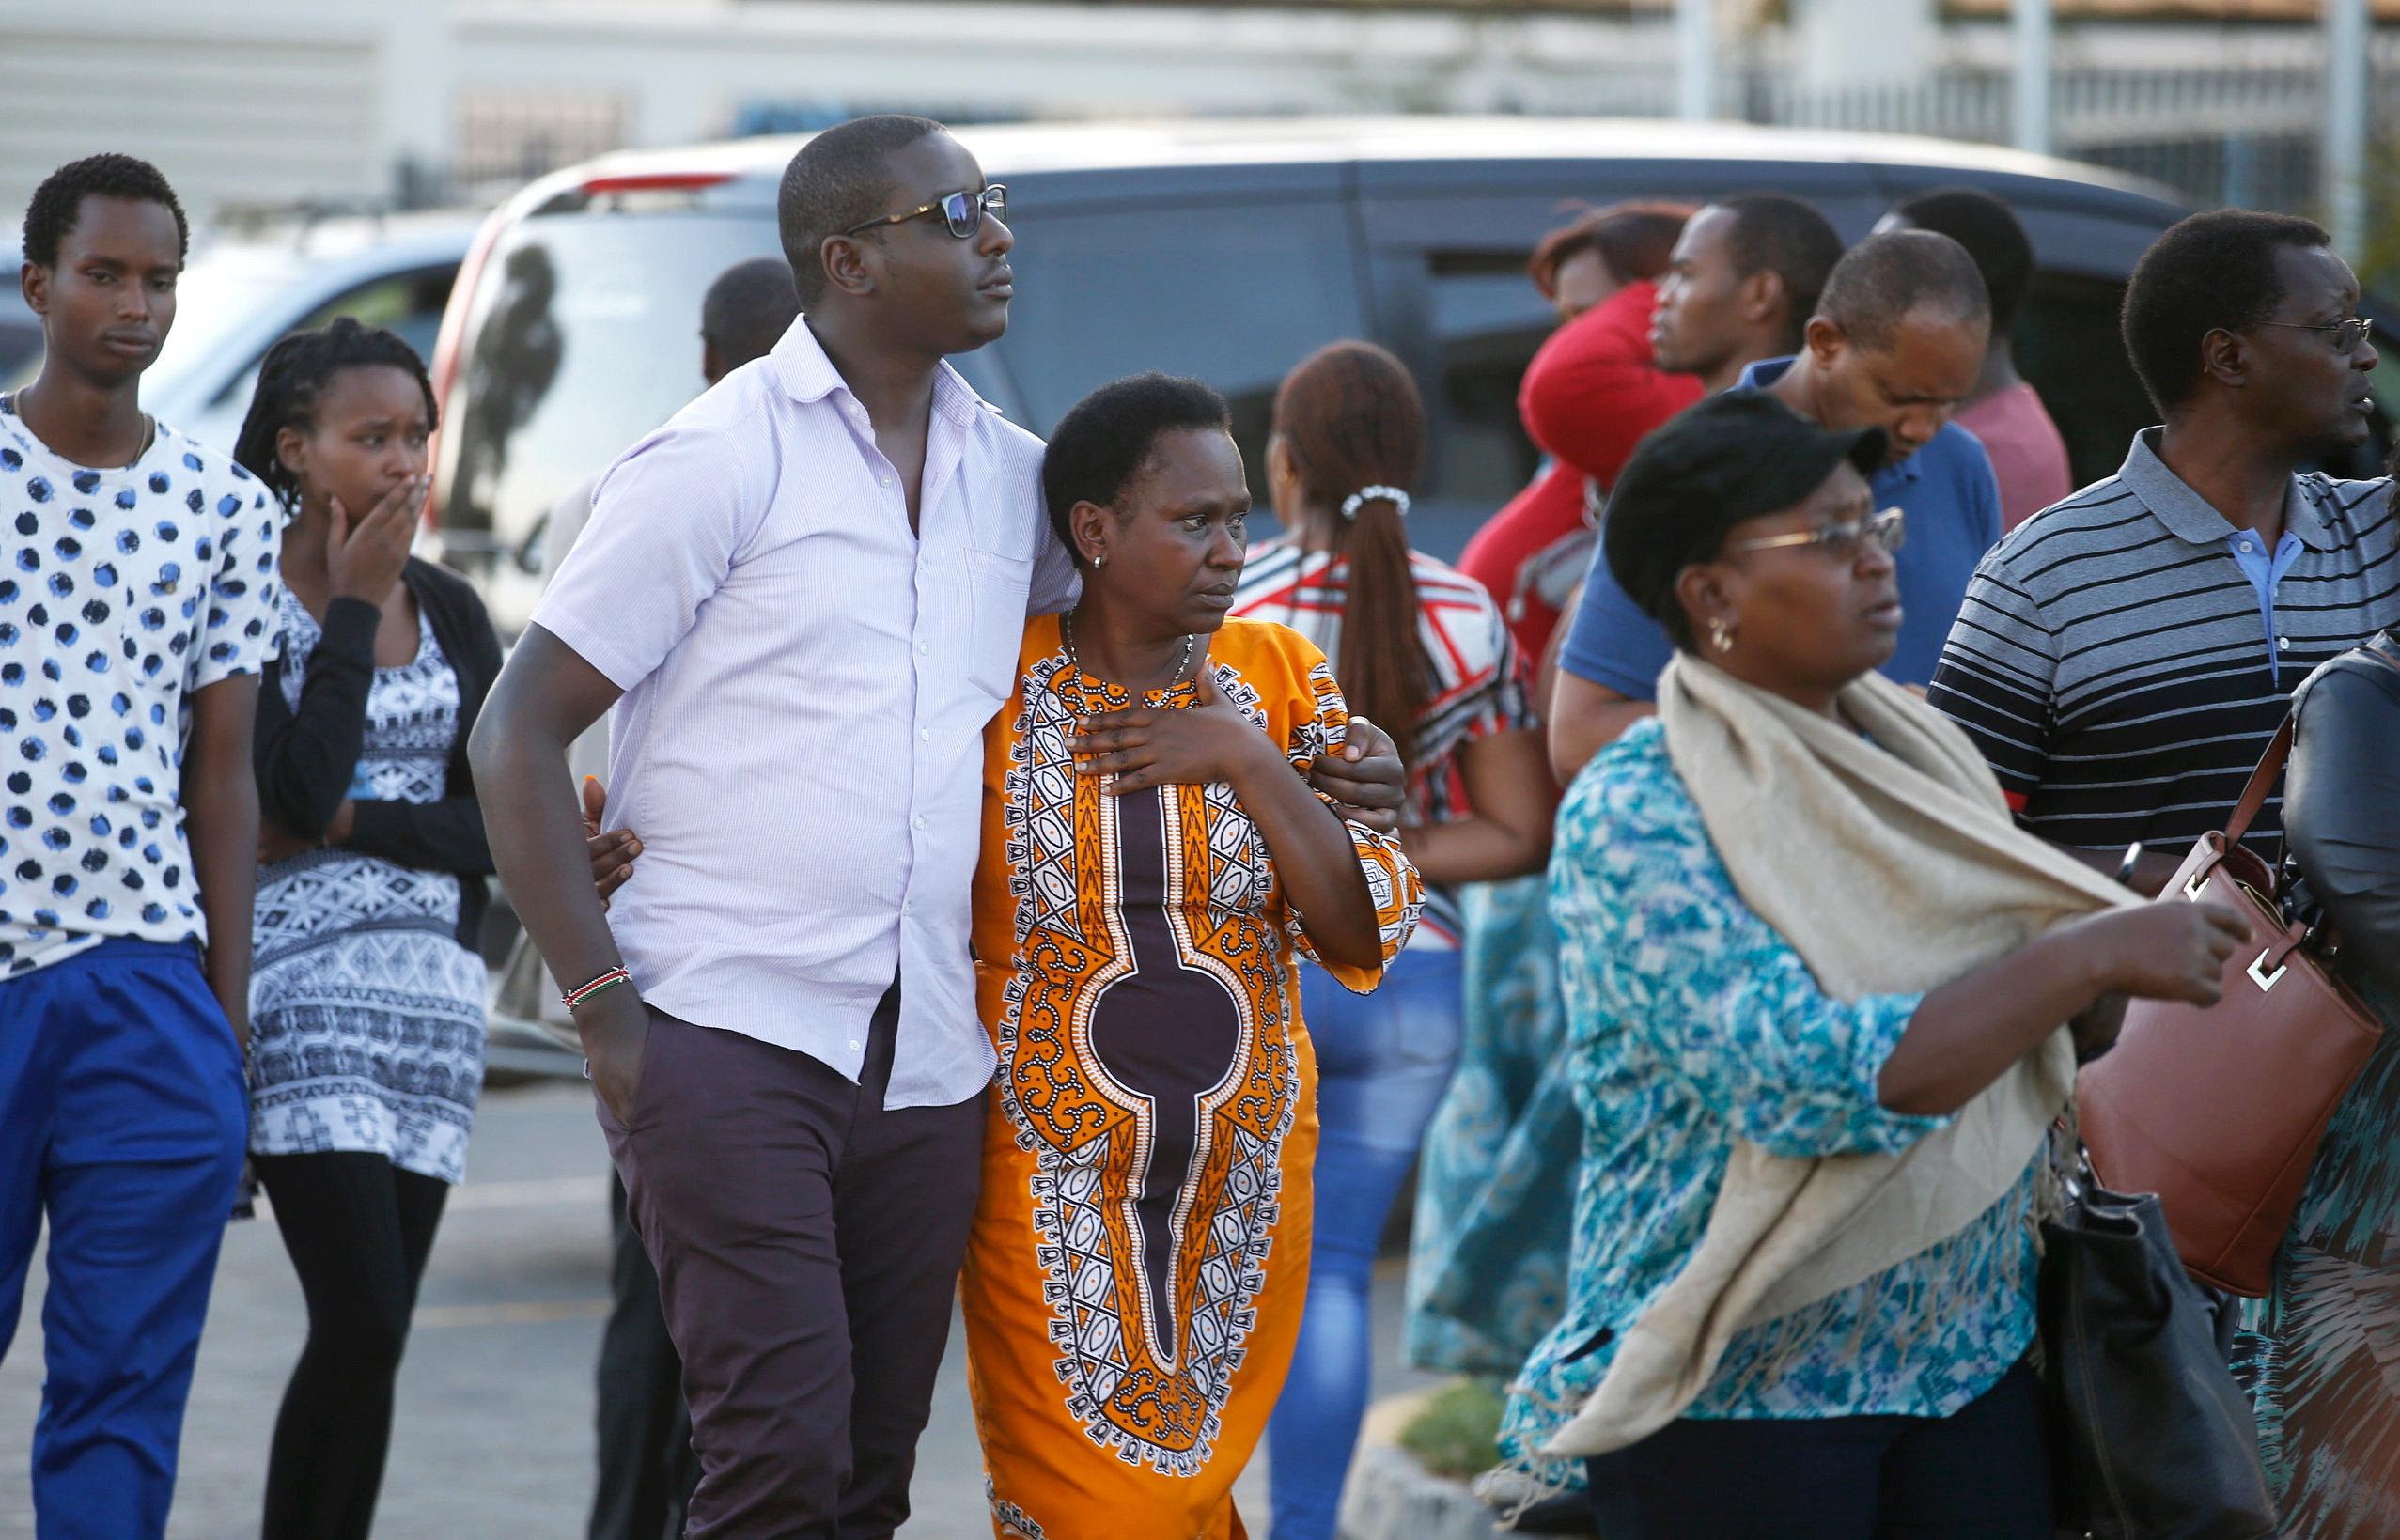 Relatives leave the information center following the Ethiopian Airlines Flight ET 302 plane crash, at the Jomo Kenyatta Inter